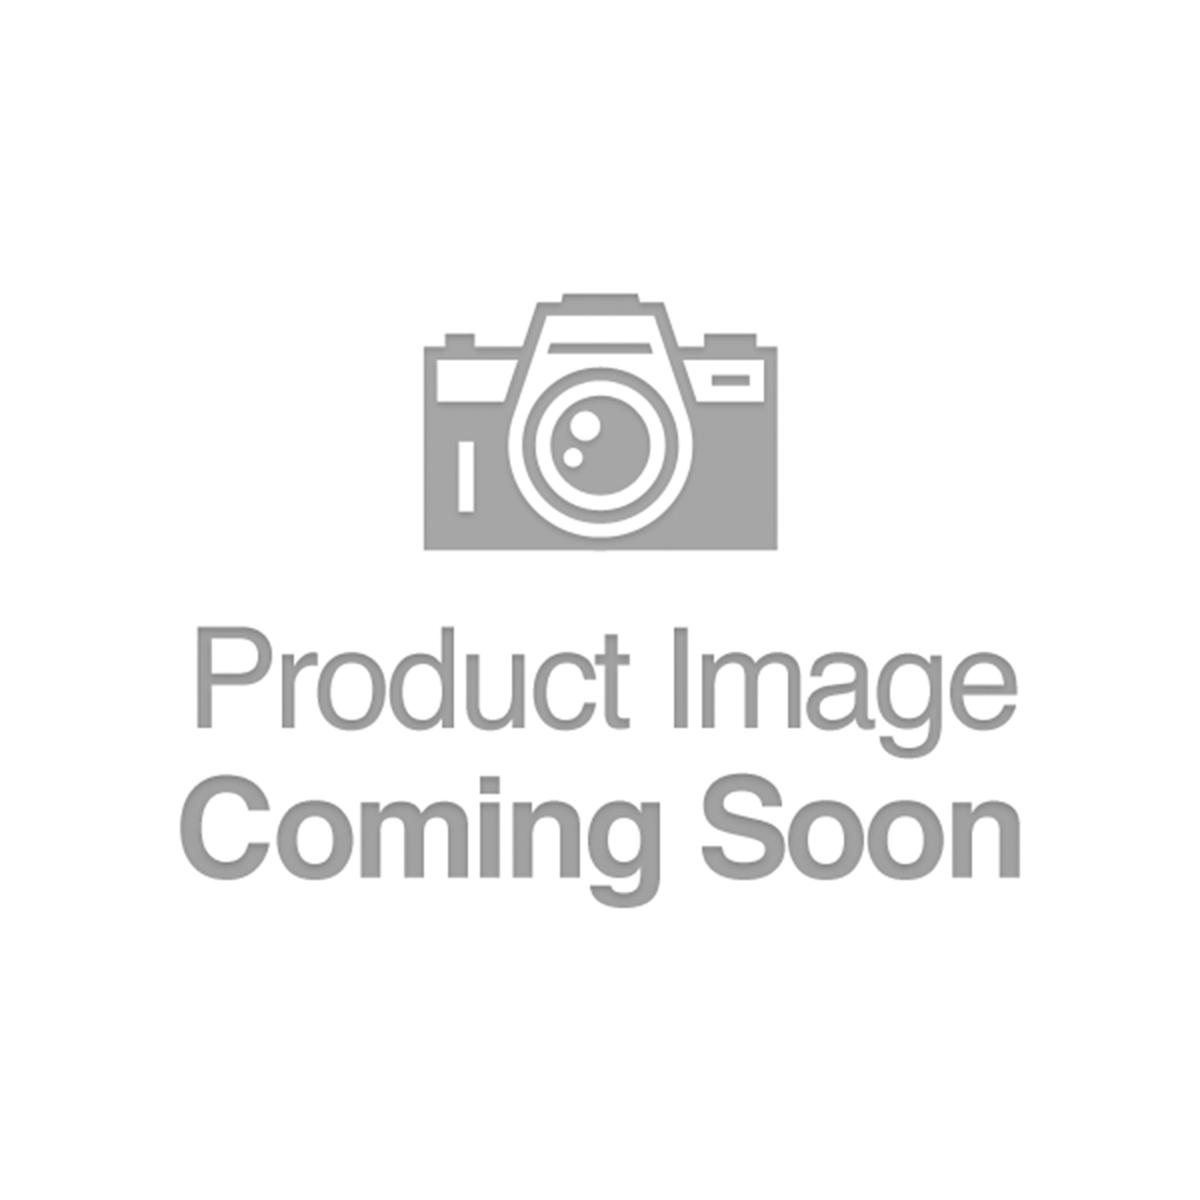 FR 293 $10 1886 Silver Certificate PMG 35